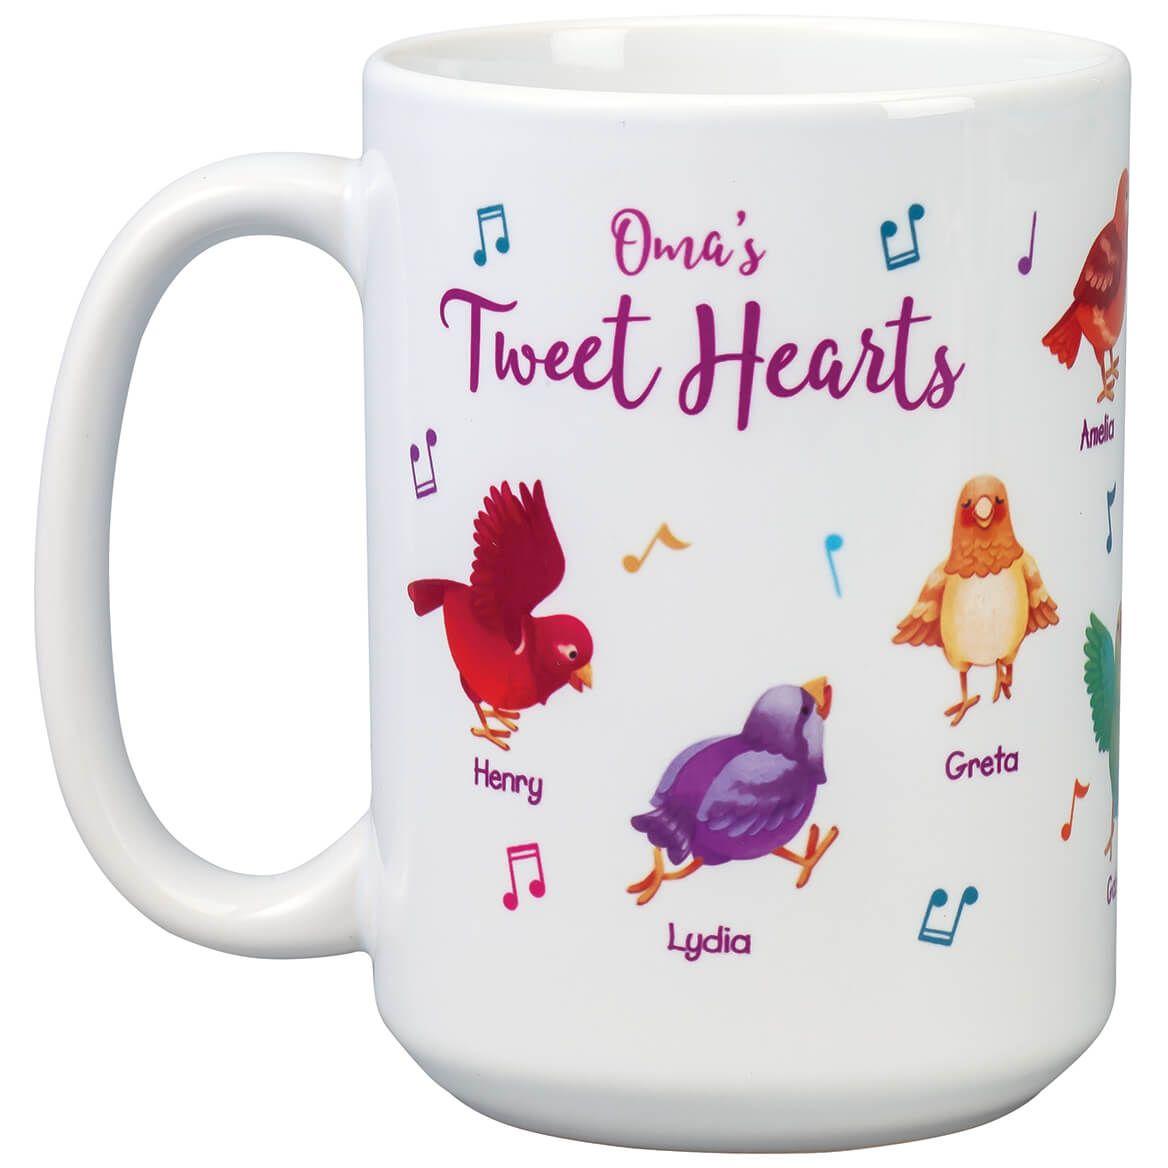 Personalized Tweet Hearts Mug-369376